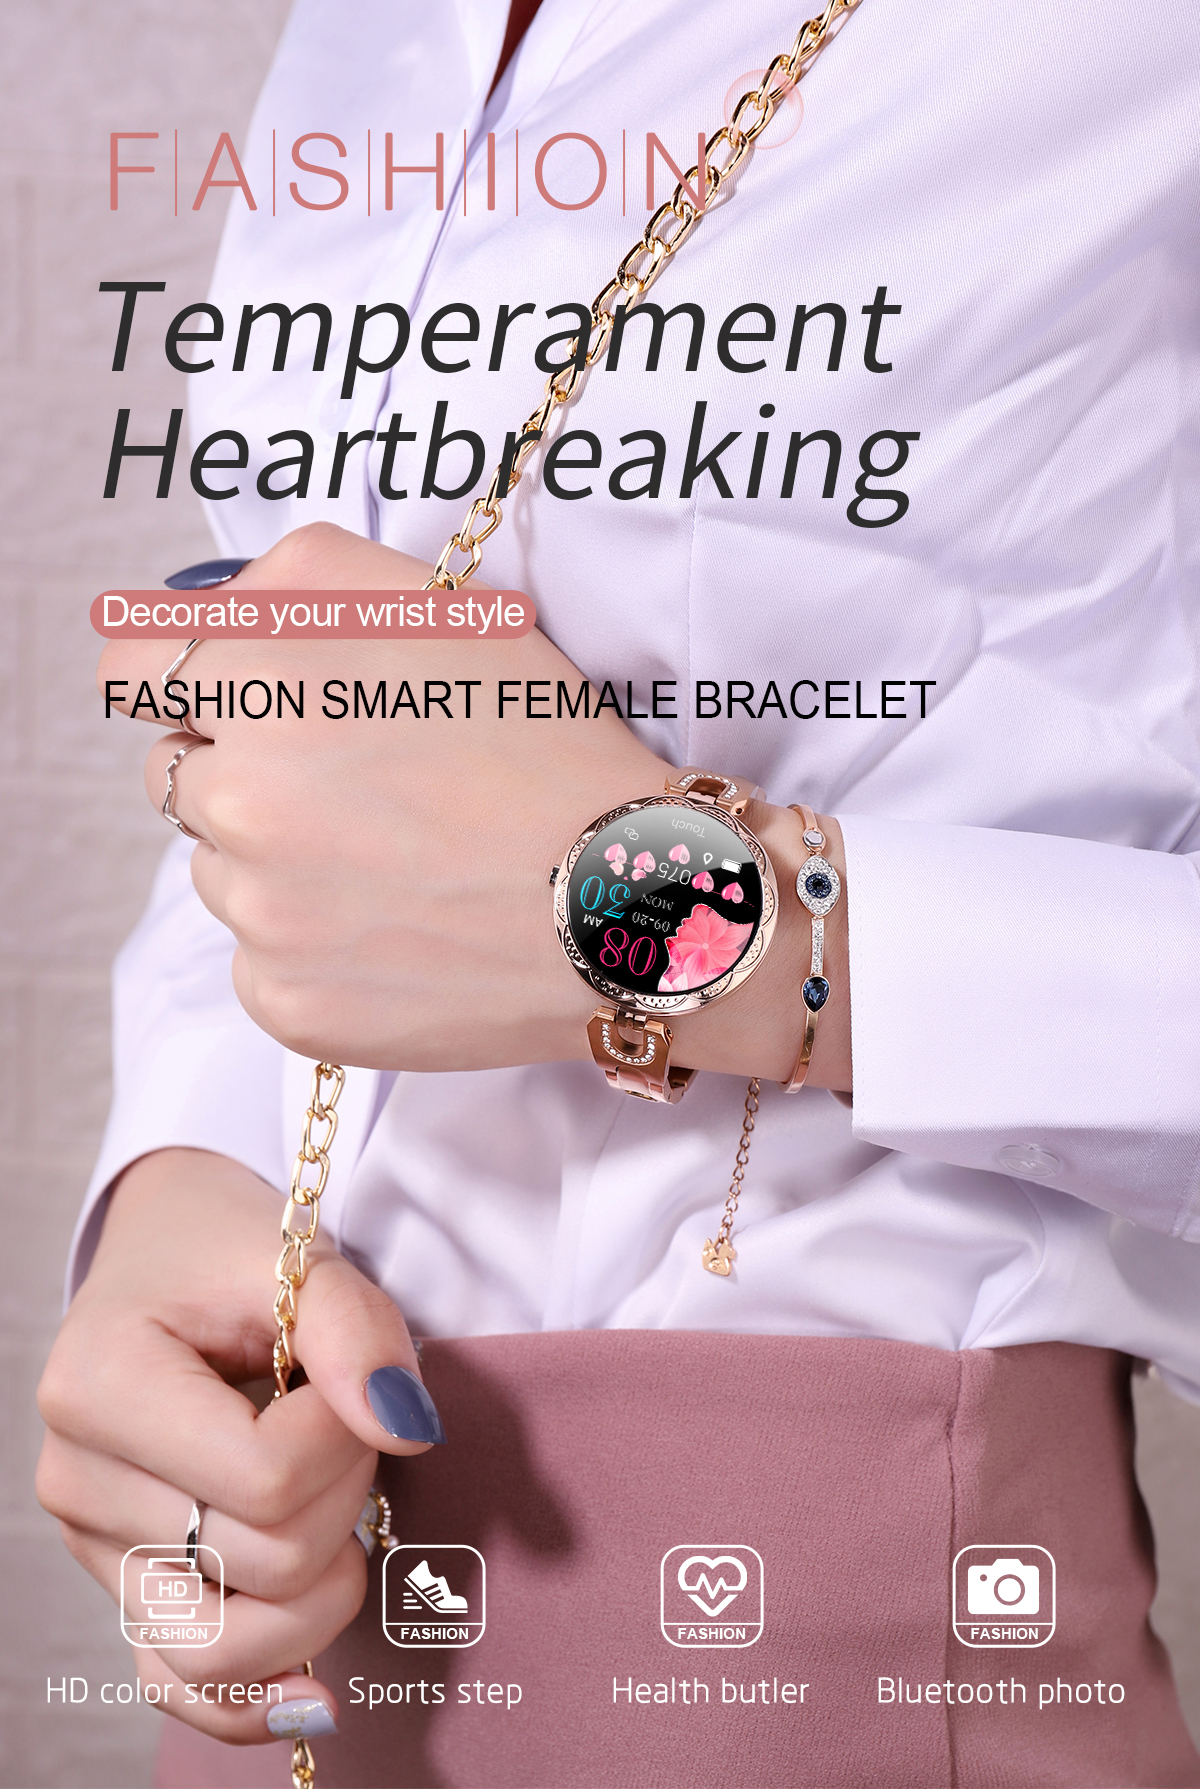 H8eadf85202694940acb7d336dc69be9ei COBRAFLY AK15 Smart Watch Women Bracelet Heart Rate Monitoring IP67 Waterproof Fitness Tracker Ladies Watches for Xiaomi Iphone